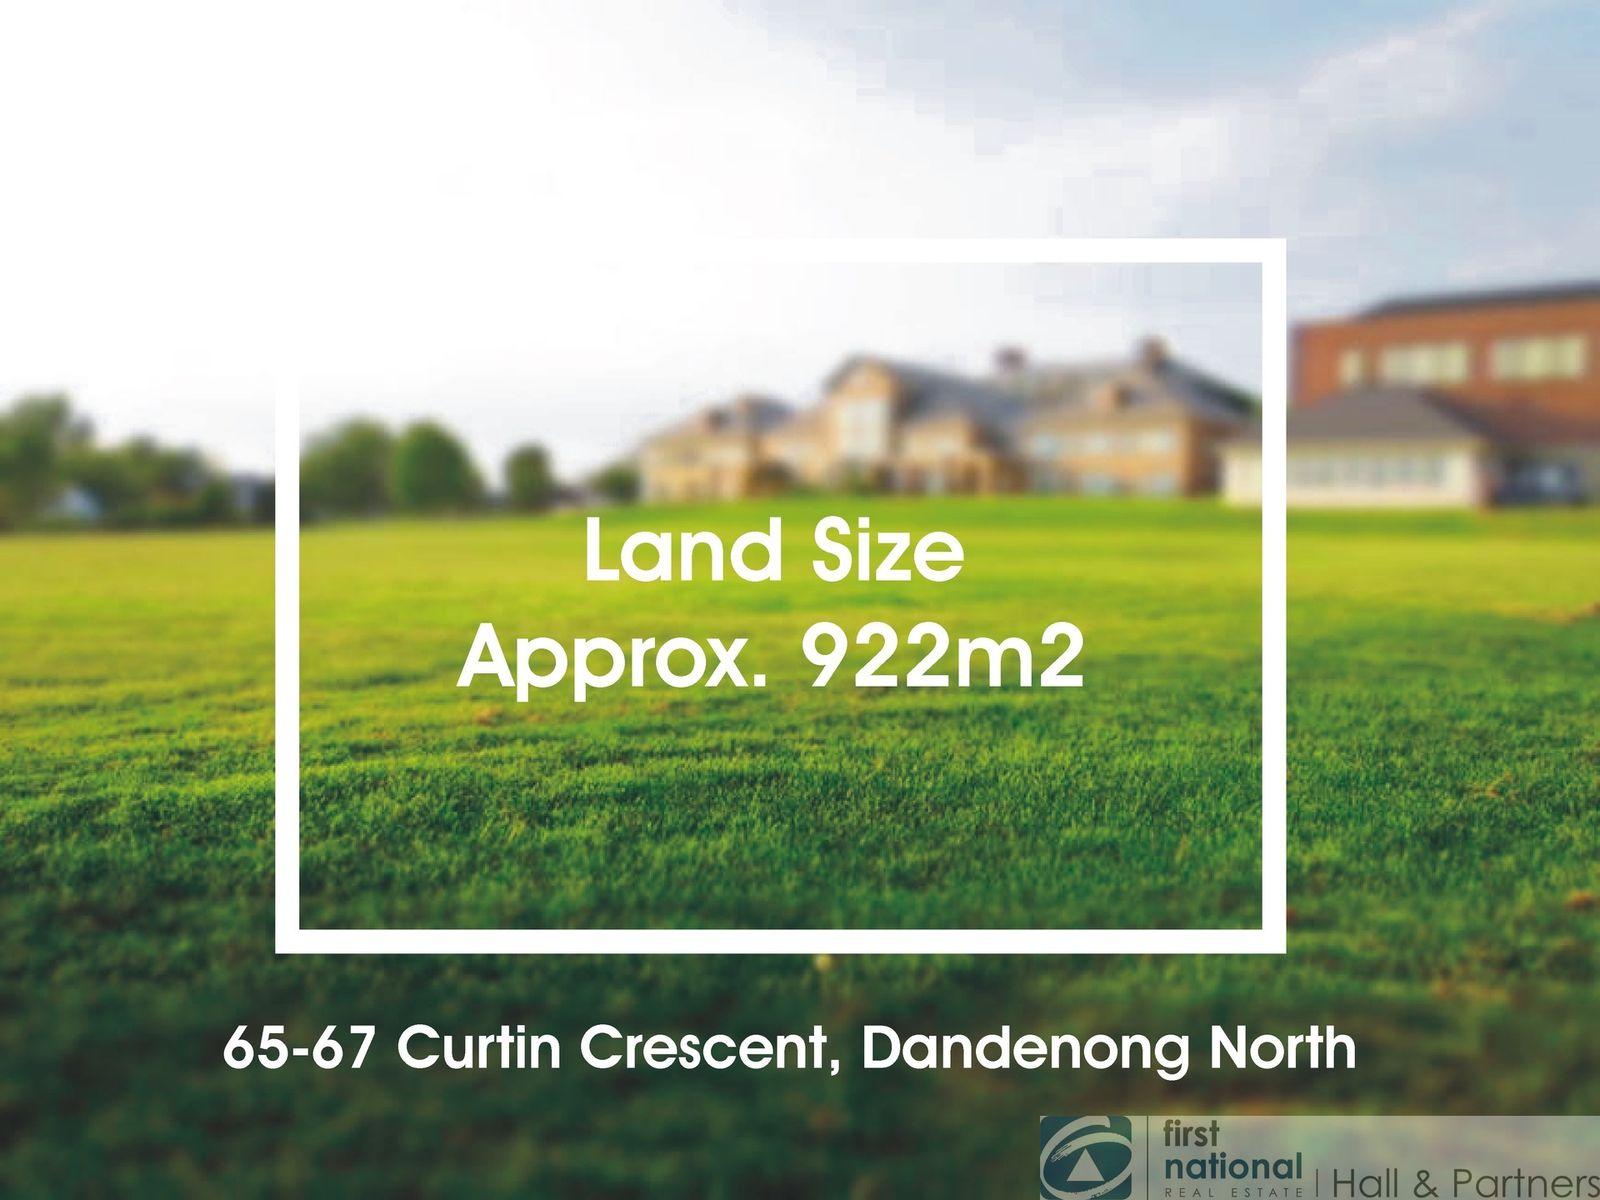 65-67 Curtin Crescent, Dandenong North, VIC 3175